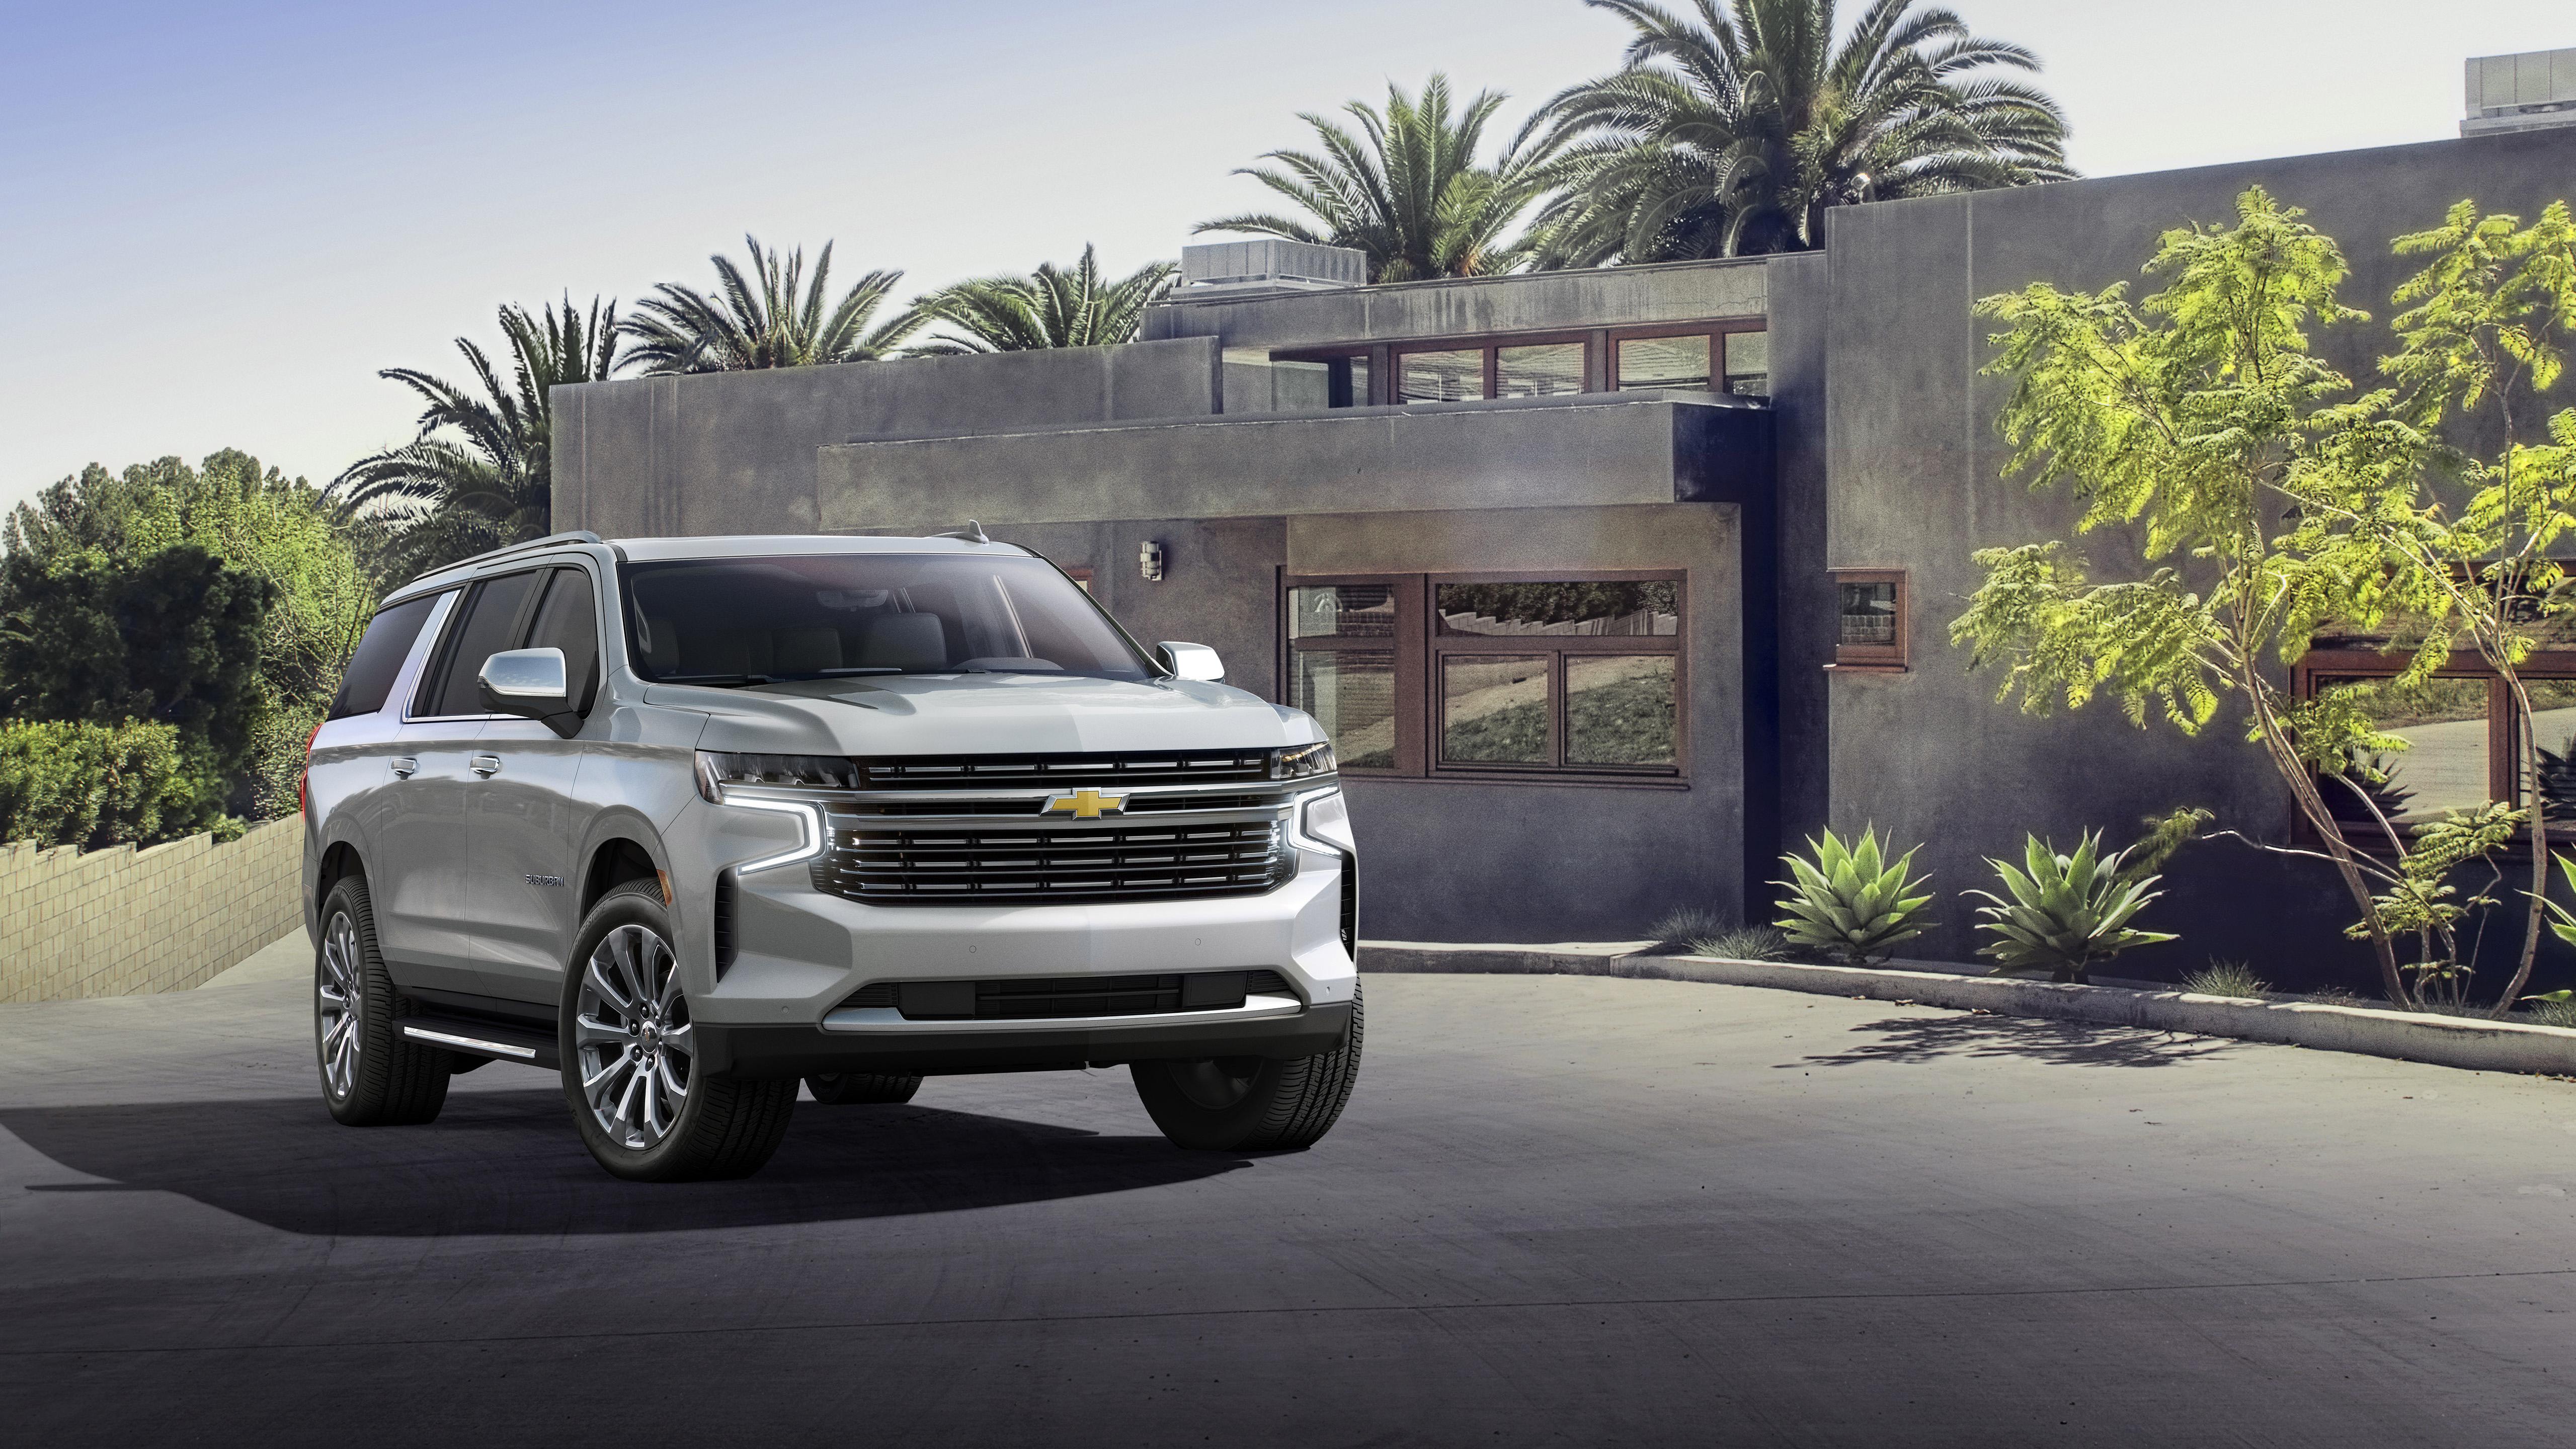 2021 Chevrolet Suburban 4K Wallpaper | HD Car Wallpapers ...